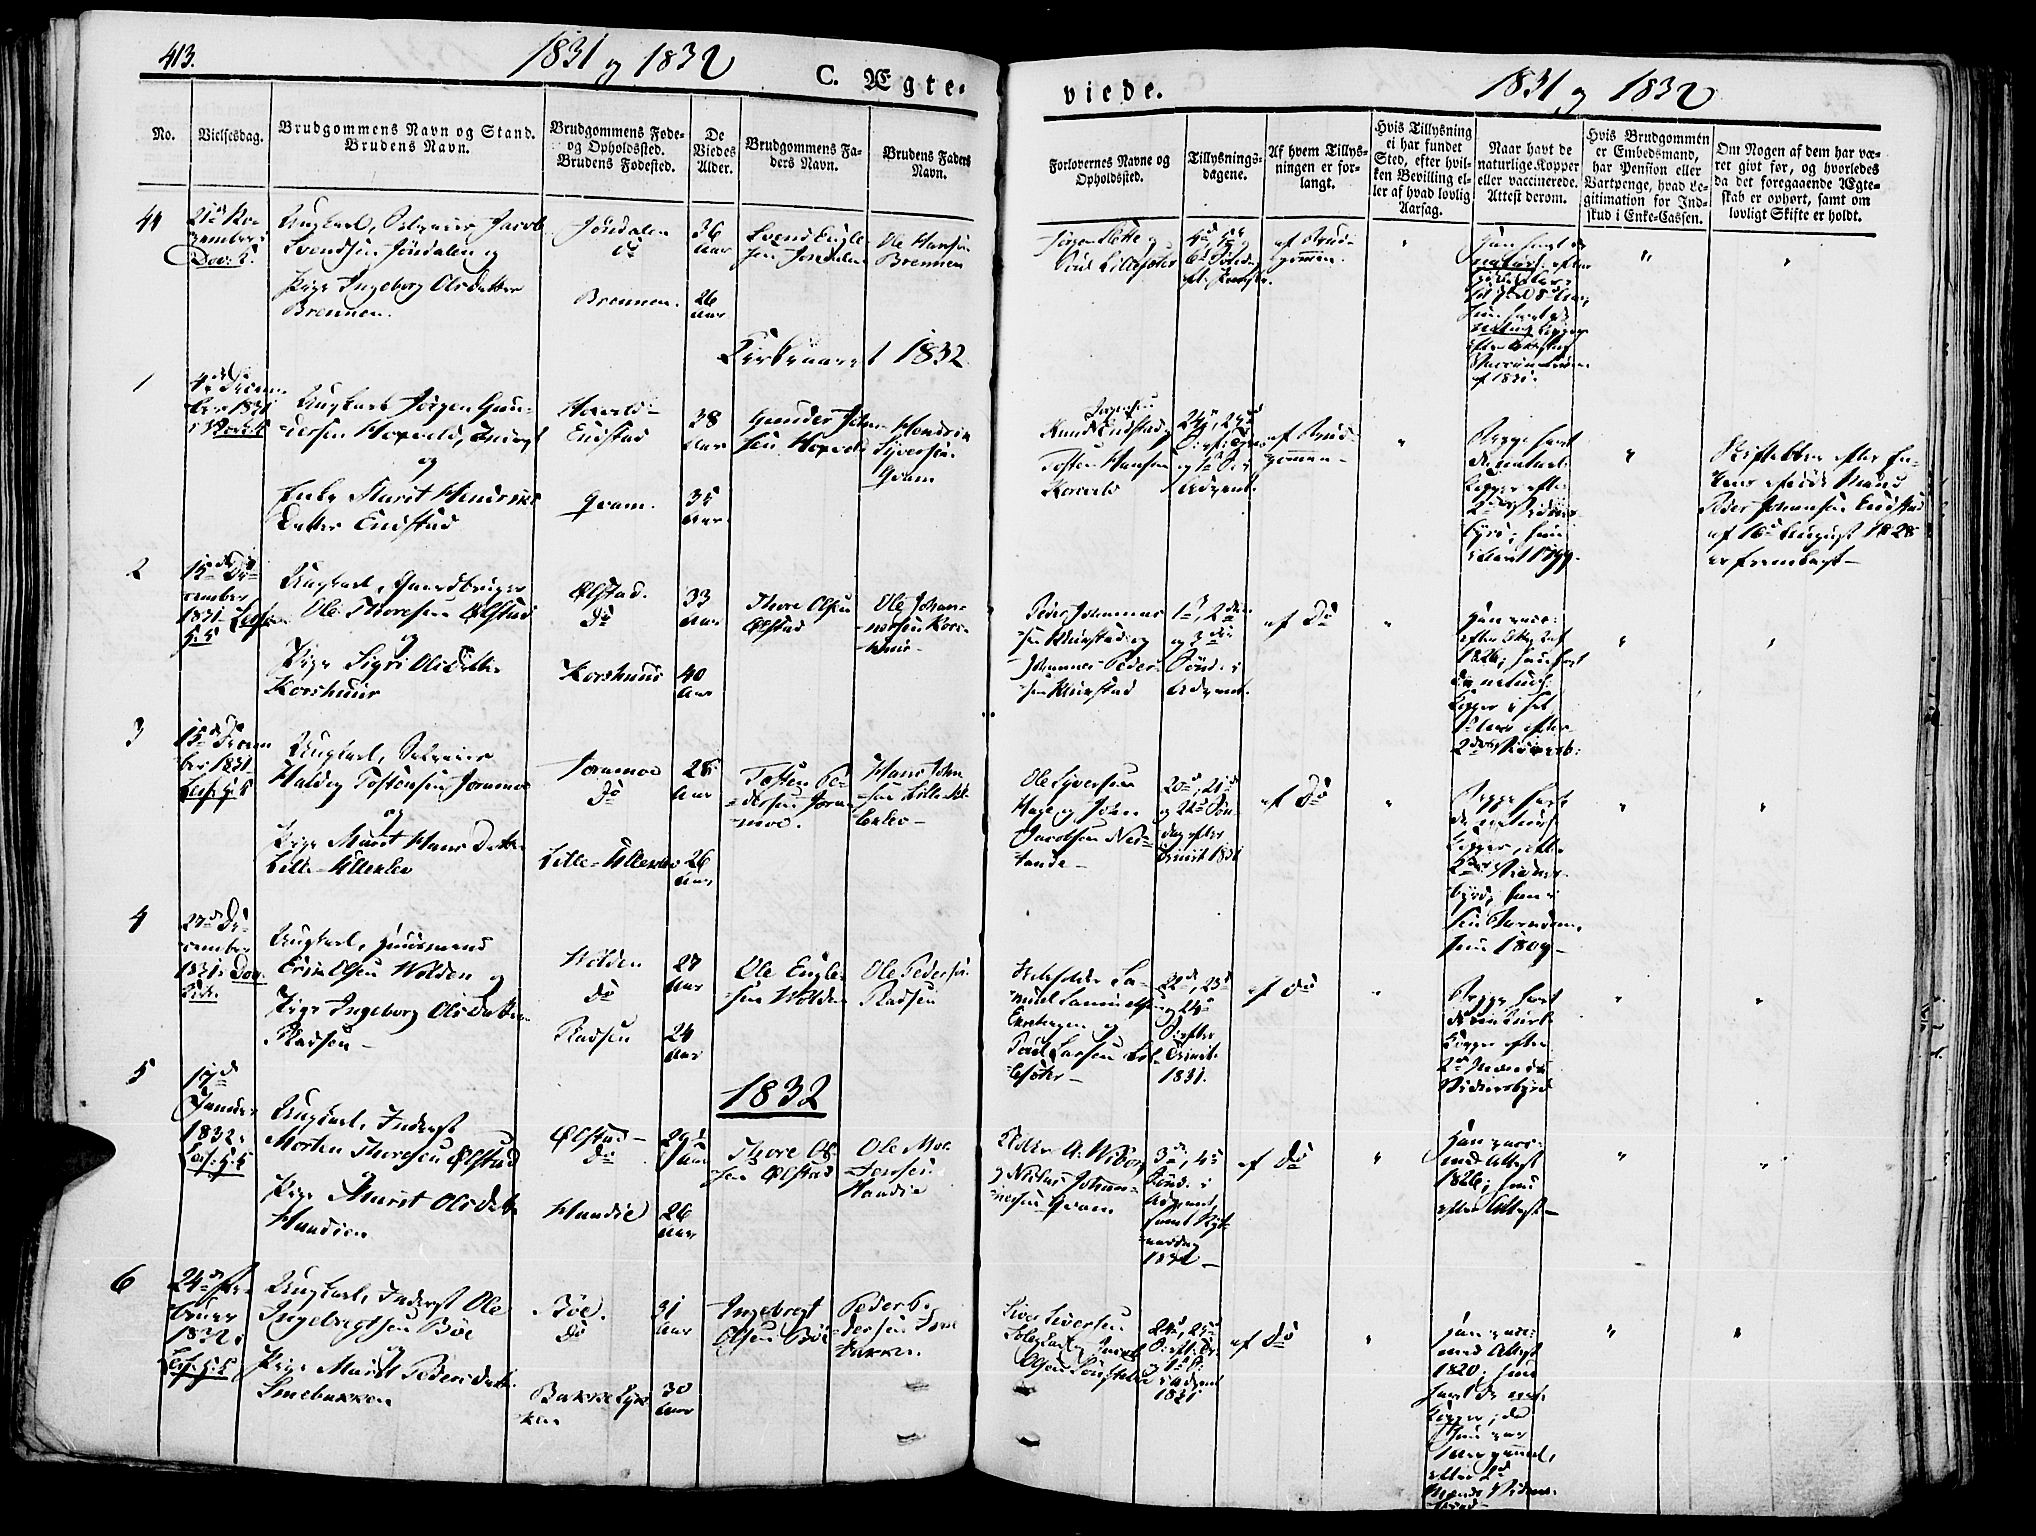 SAH, Lesja prestekontor, Ministerialbok nr. 5, 1830-1842, s. 413